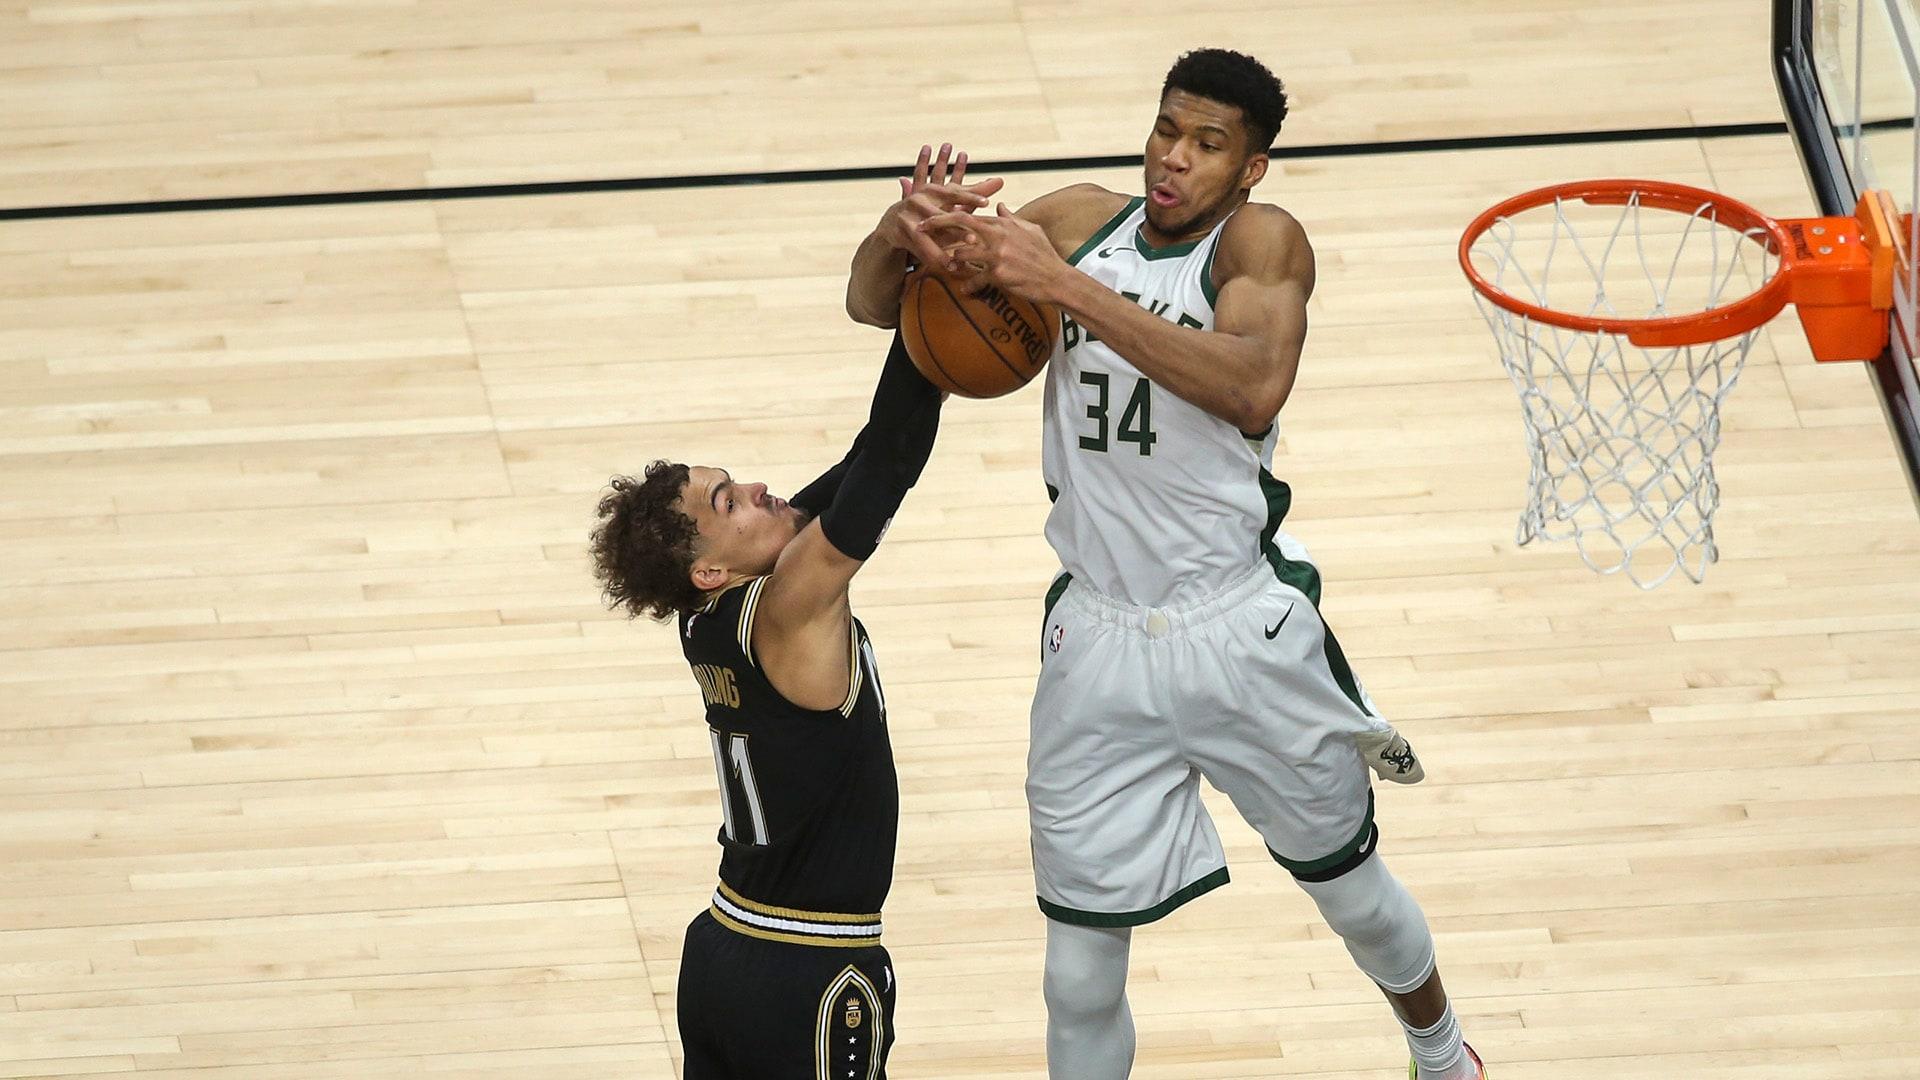 Series Preview: Bucks' breakthrough up against ahead-of-schedule Hawks